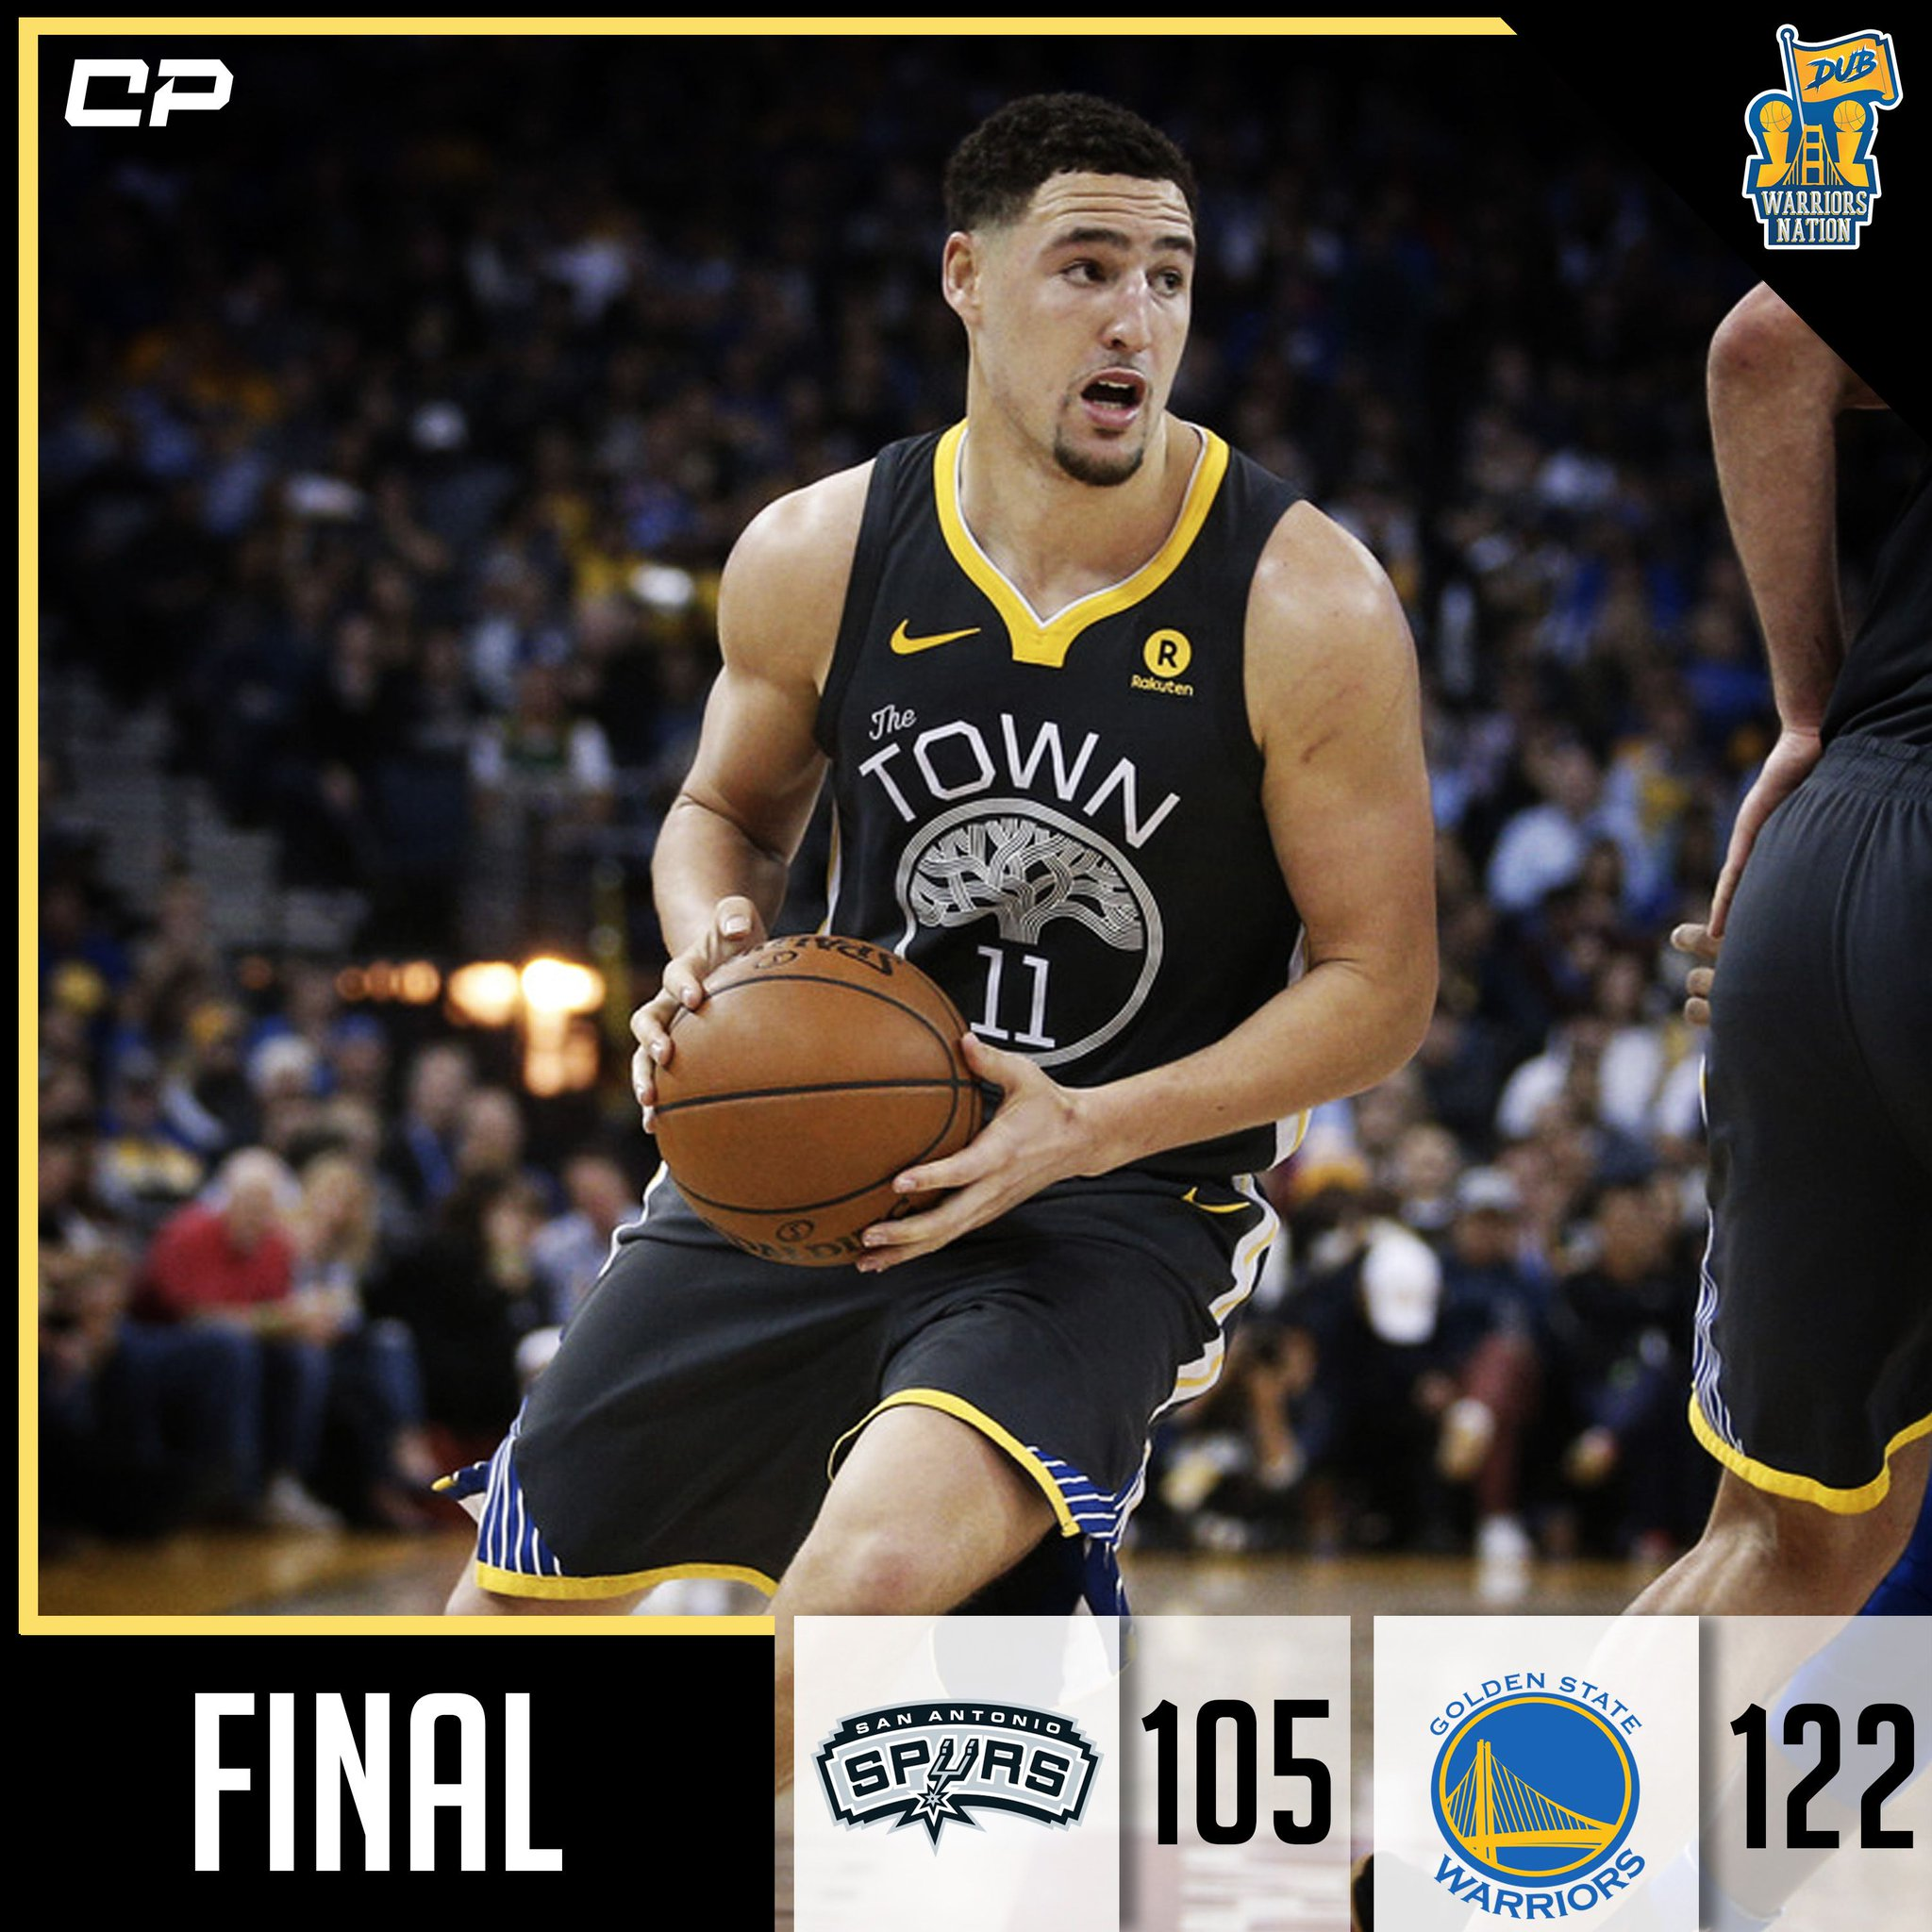 [FINAL] Warriors defeat Spurs, 122-105.  Klay Thompson: 25 PTS, 3 REB  HIGHLIGHTS: https://t.co/PLr9sX4I1U https://t.co/8rnr6lEIcf